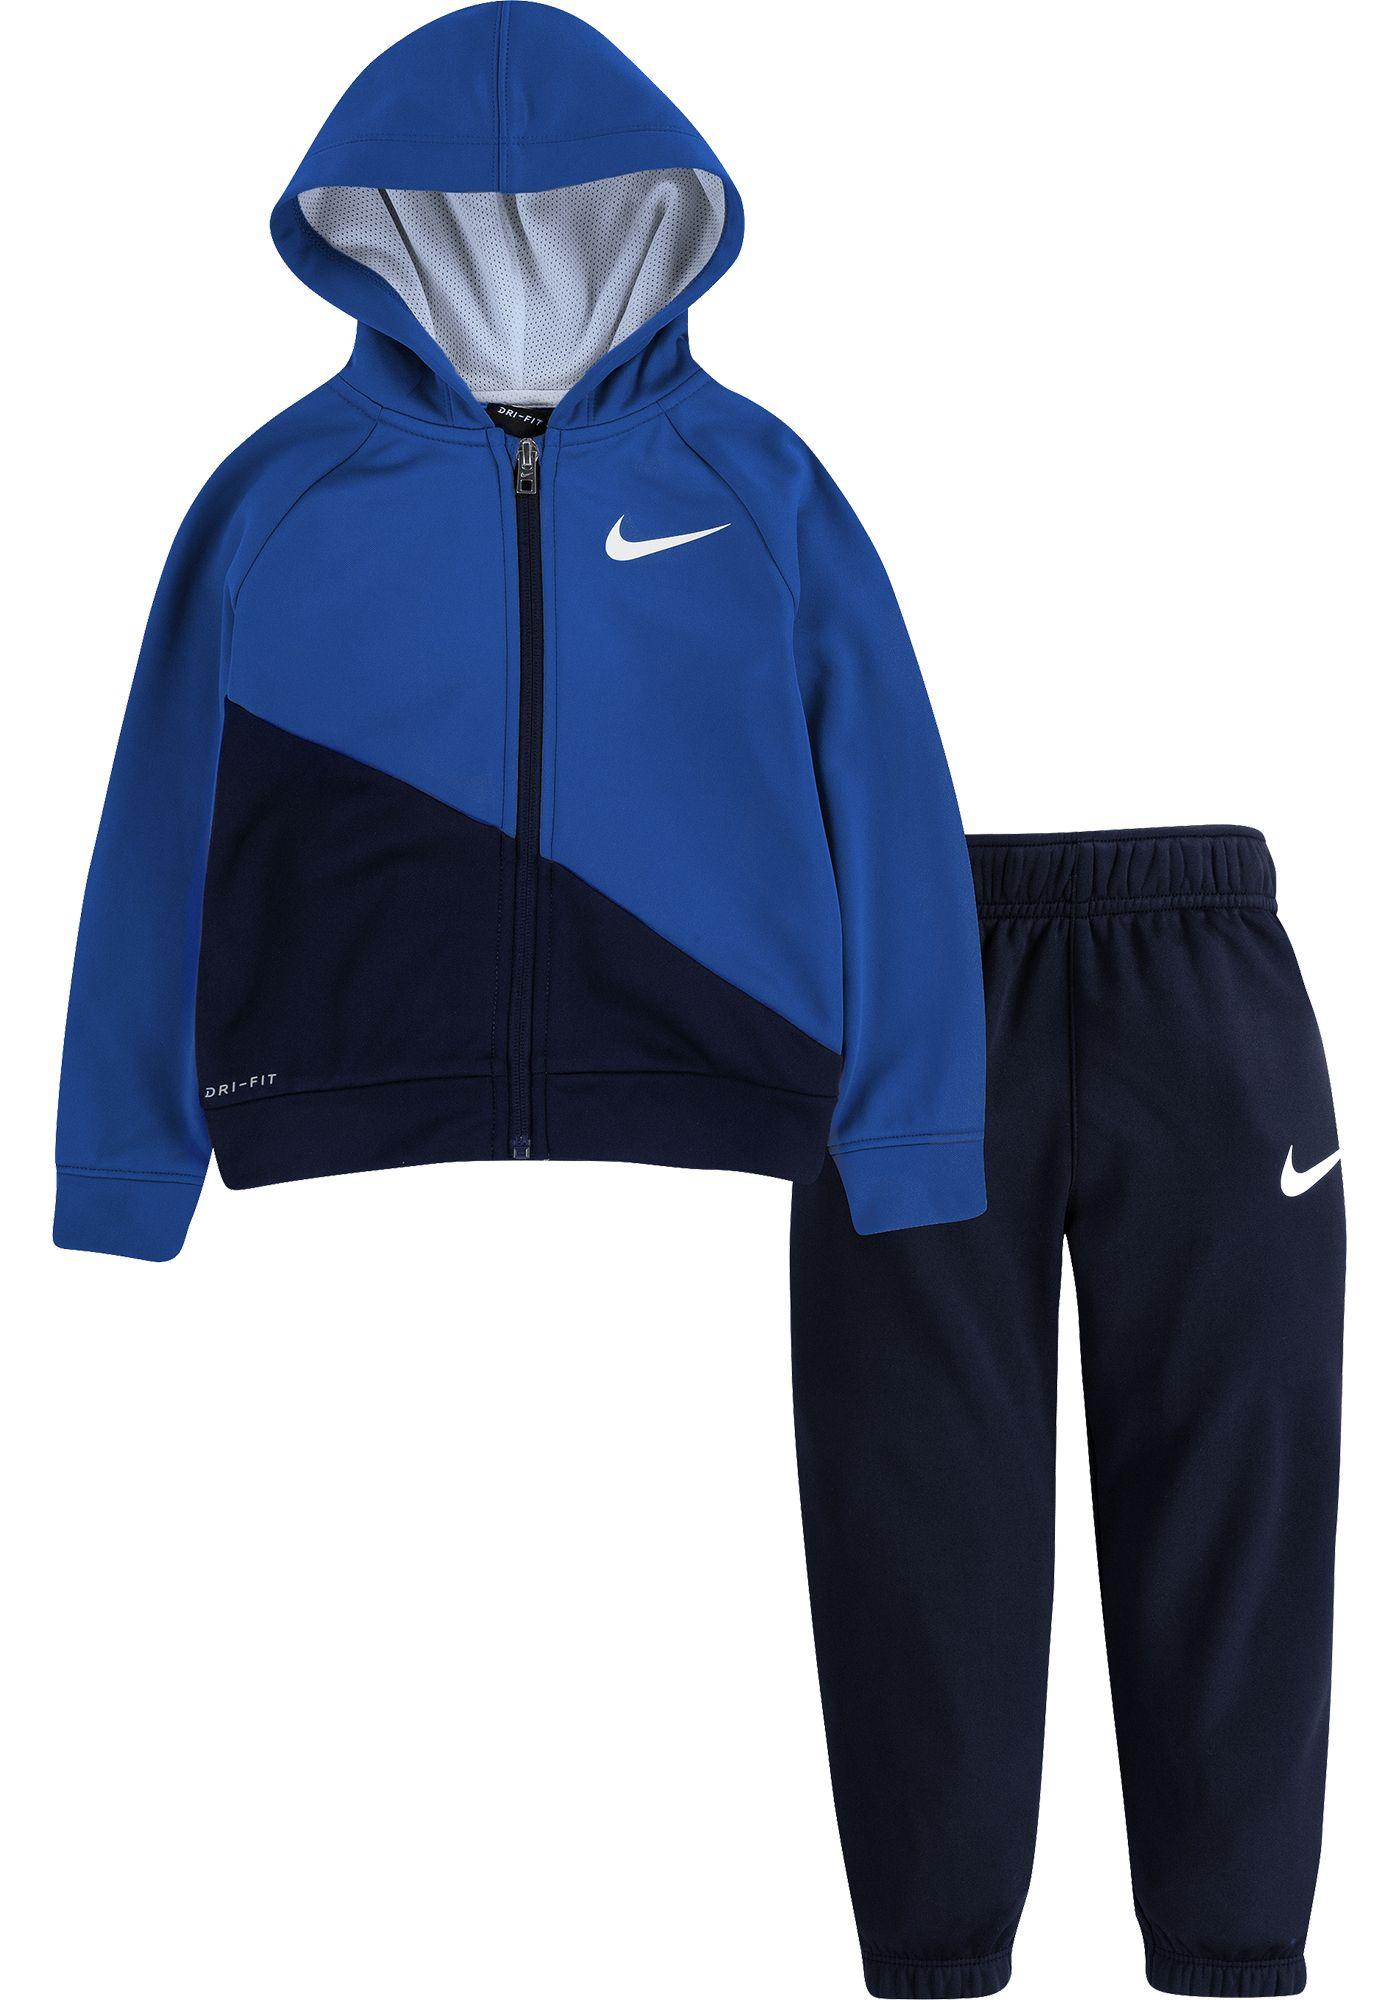 Nike Toddler Boys' Therma Fleece Zip Hoodie and Pants Set